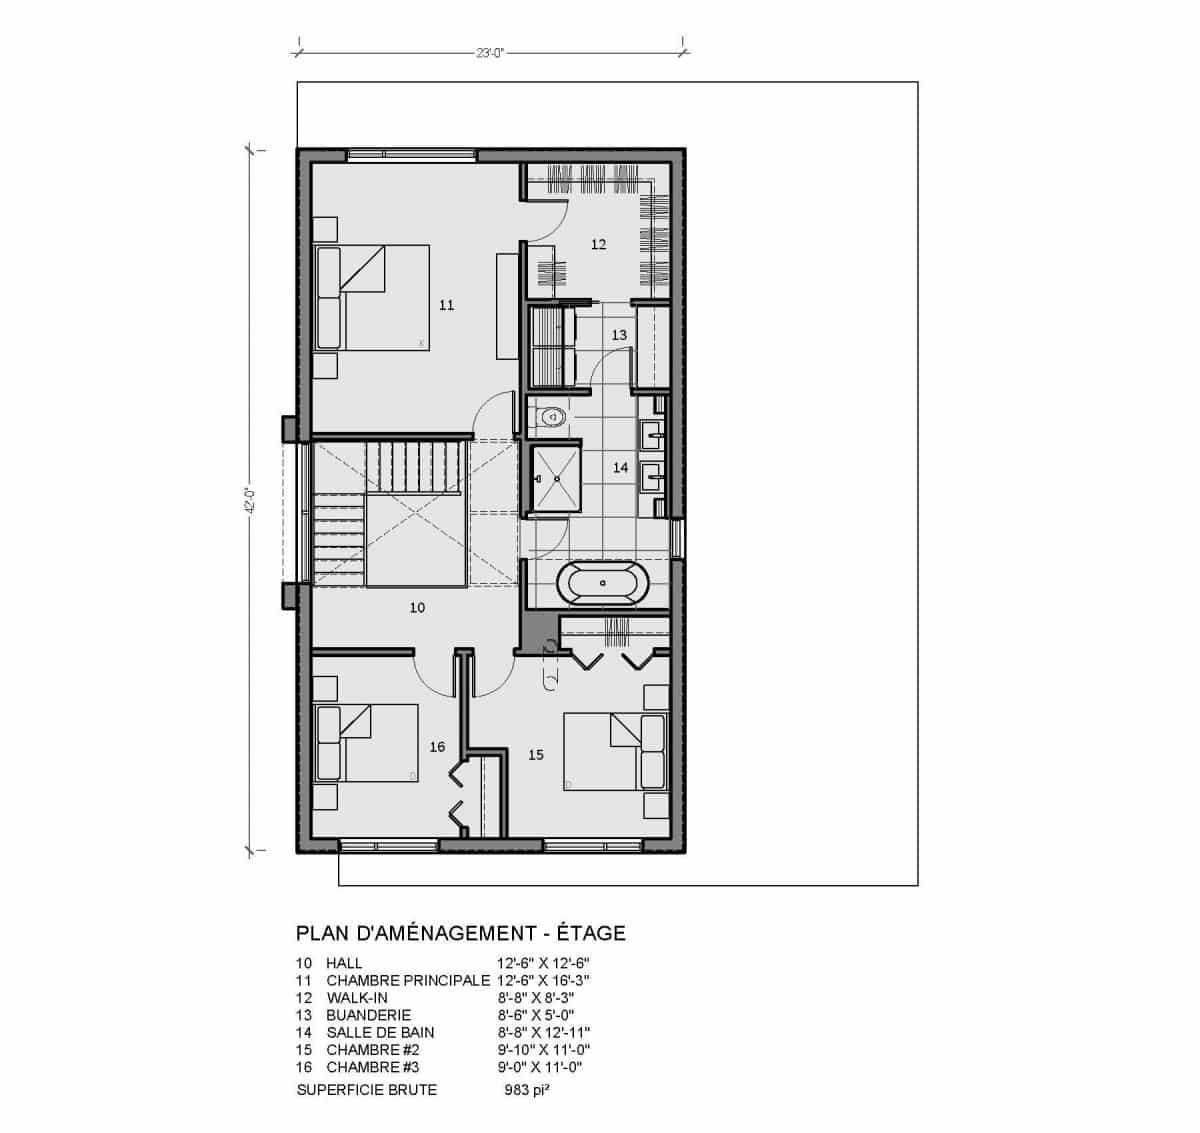 plan de maison étage Oslo